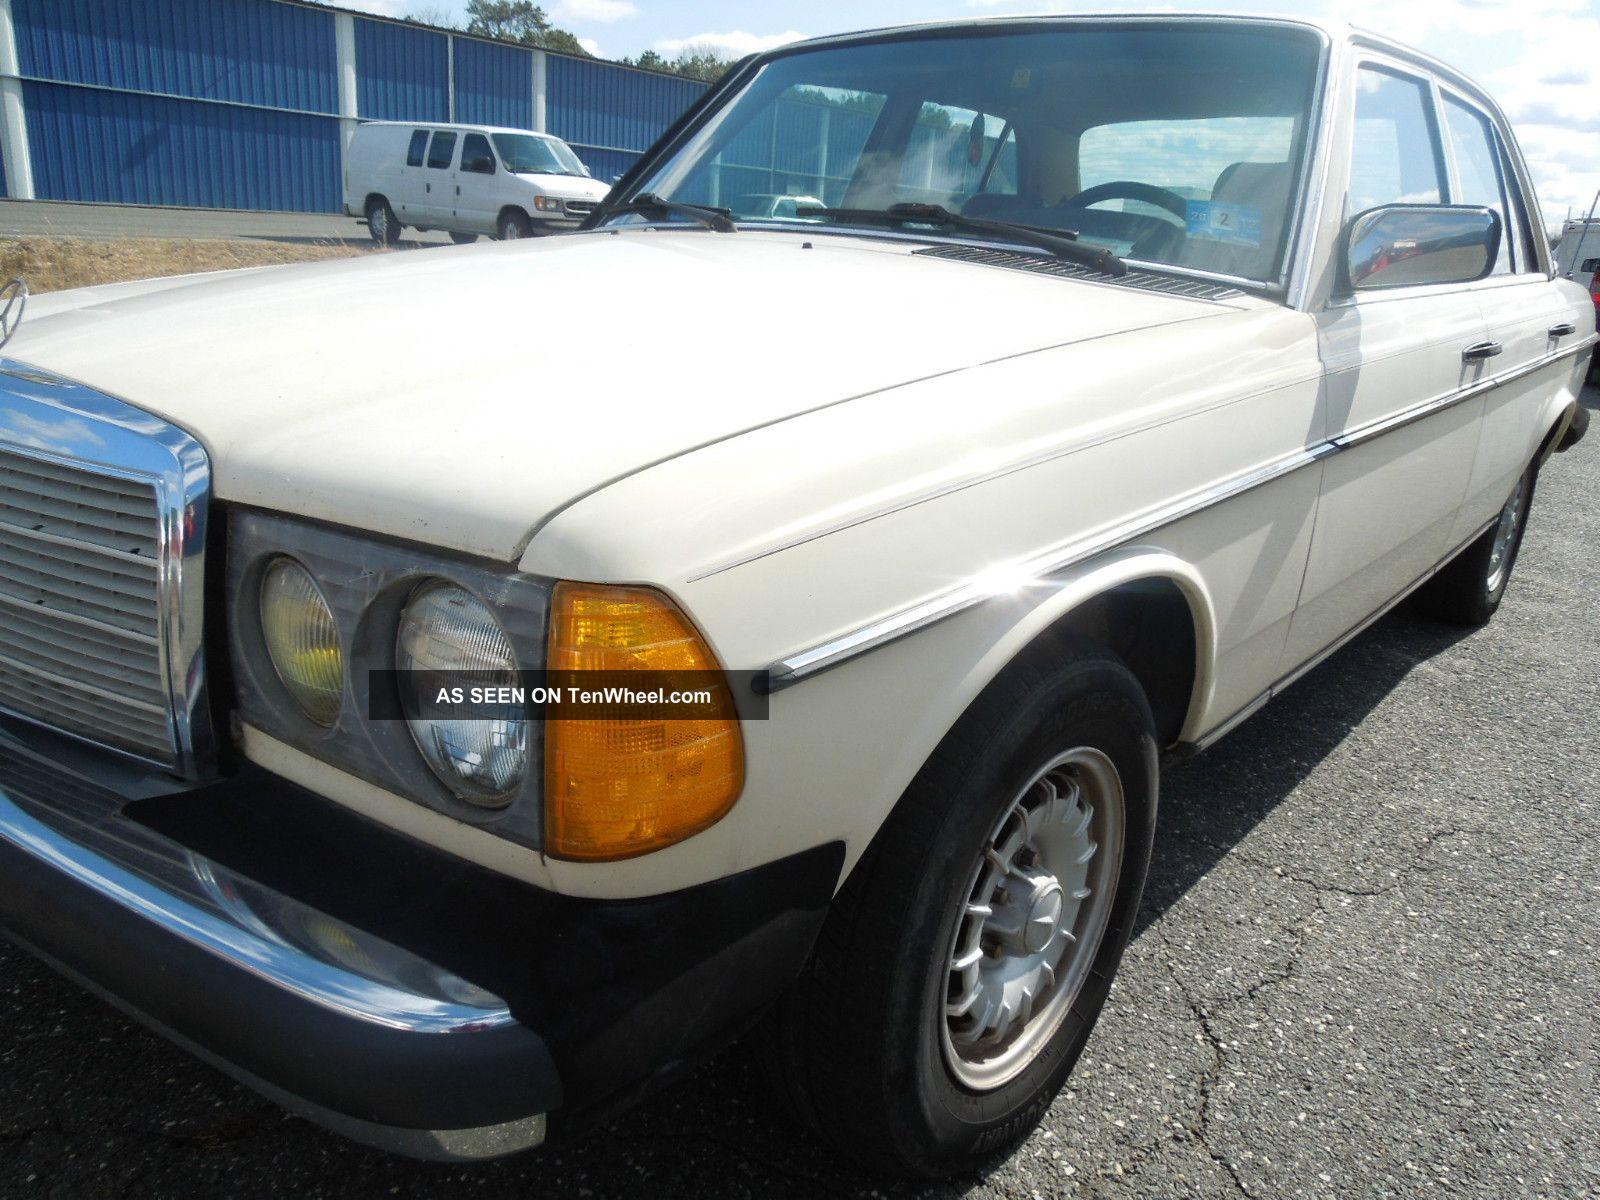 1983 mercedes benz 300d turbo diesel automatic rust for Mercedes benz turbo diesel